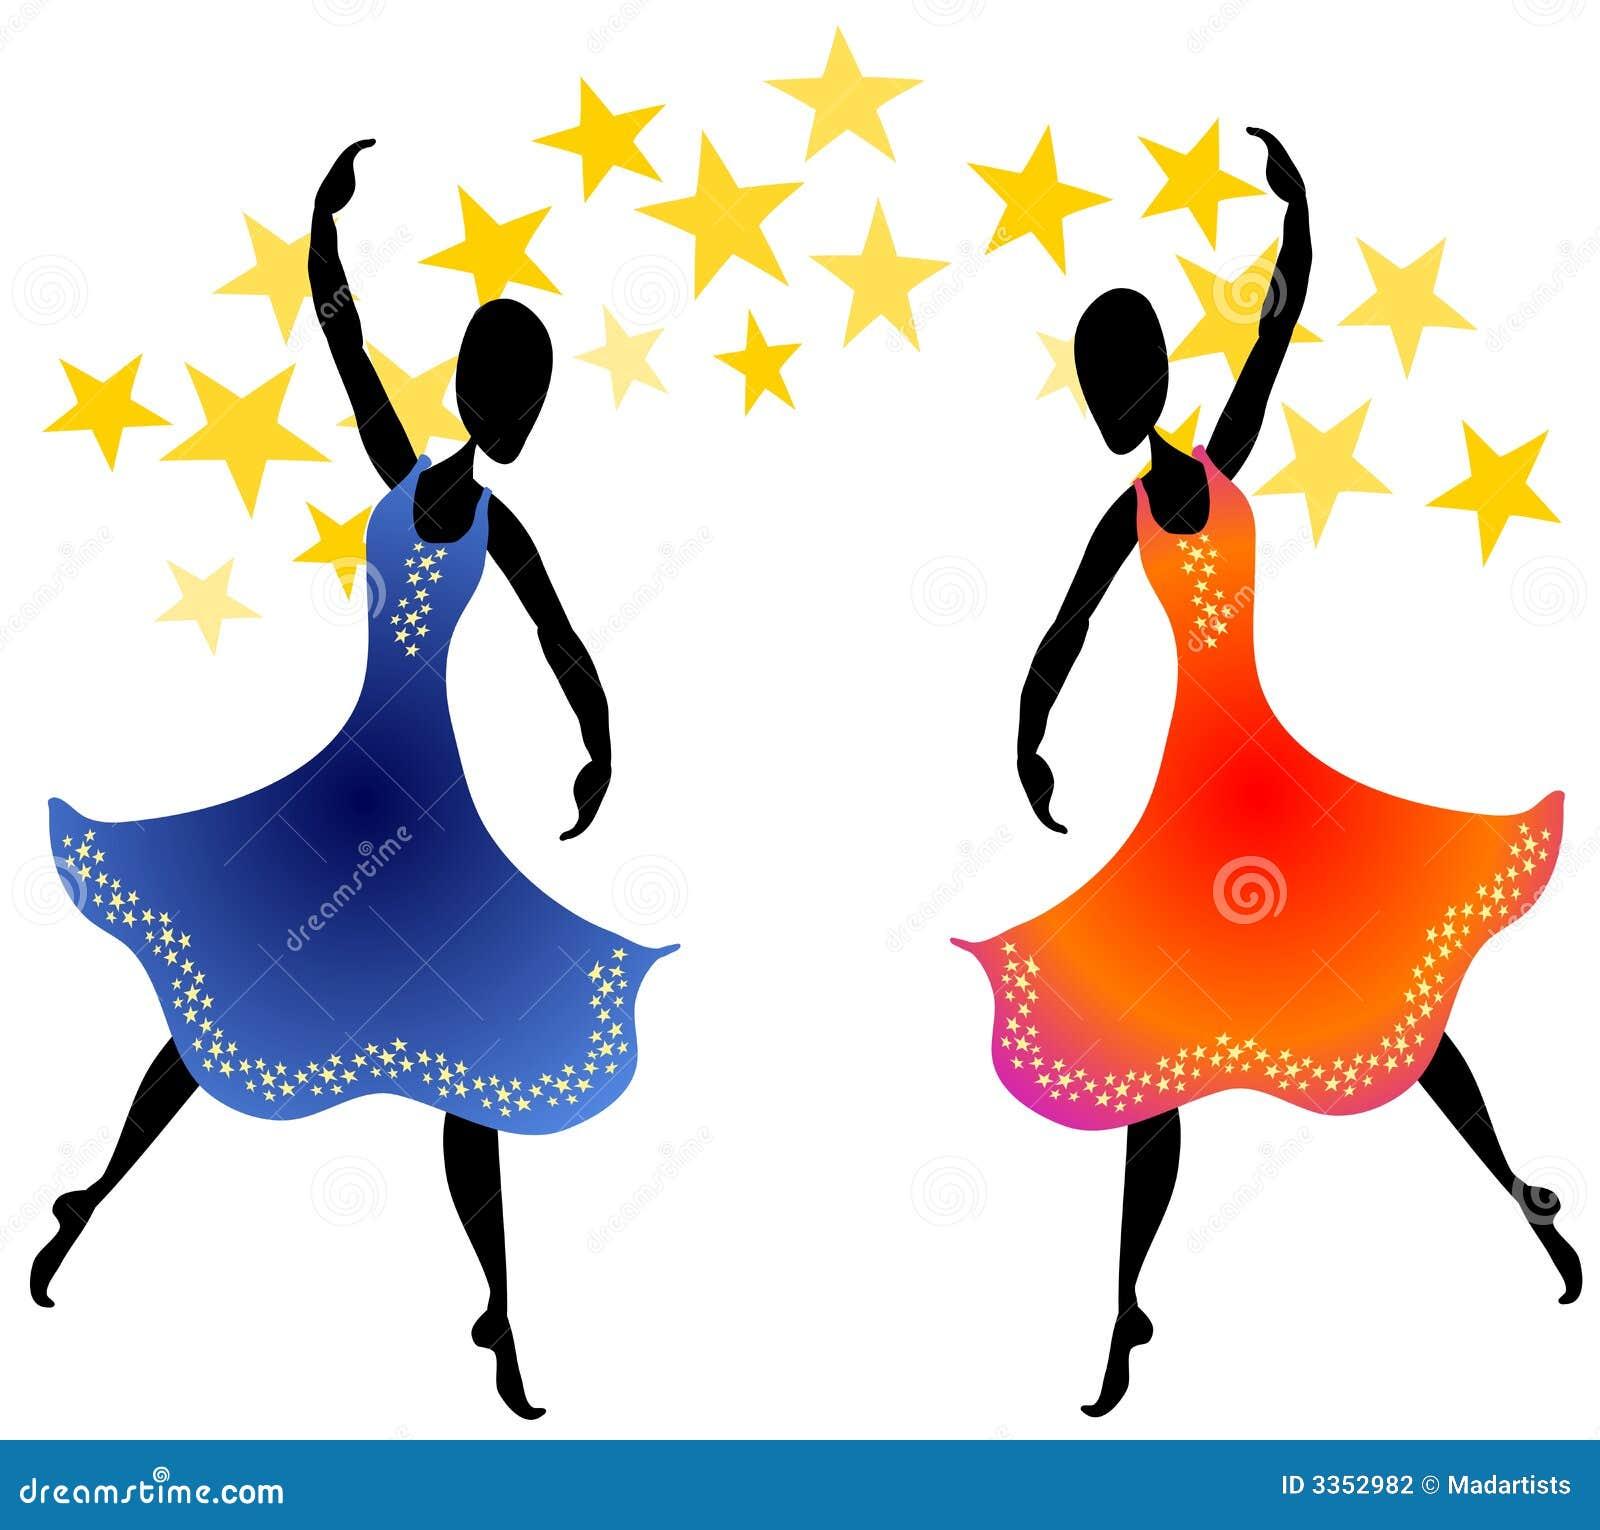 various women dancing clip art stock illustration illustration of rh dreamstime com dancing girl clipart images dancing girl clipart images